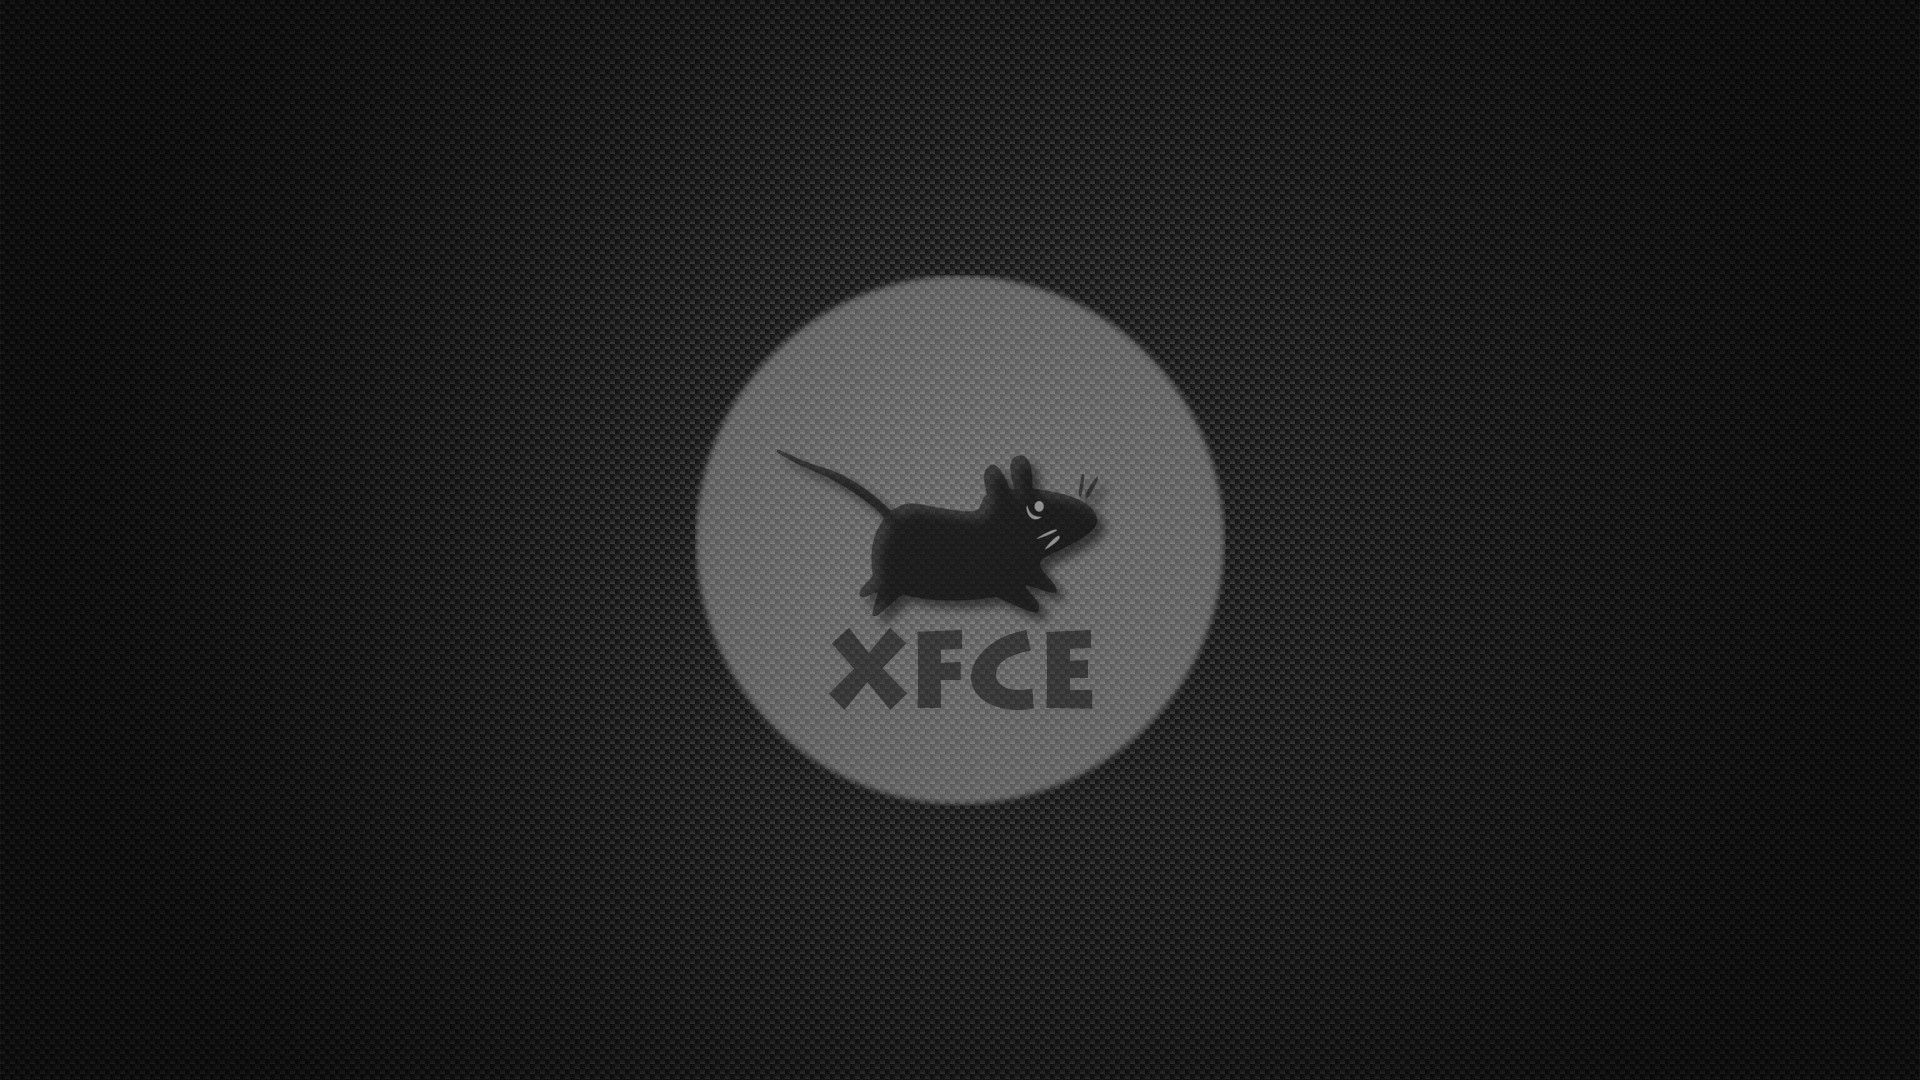 logos mice fibers xfce logo carbon fiber mouse desktop hd wallpaper